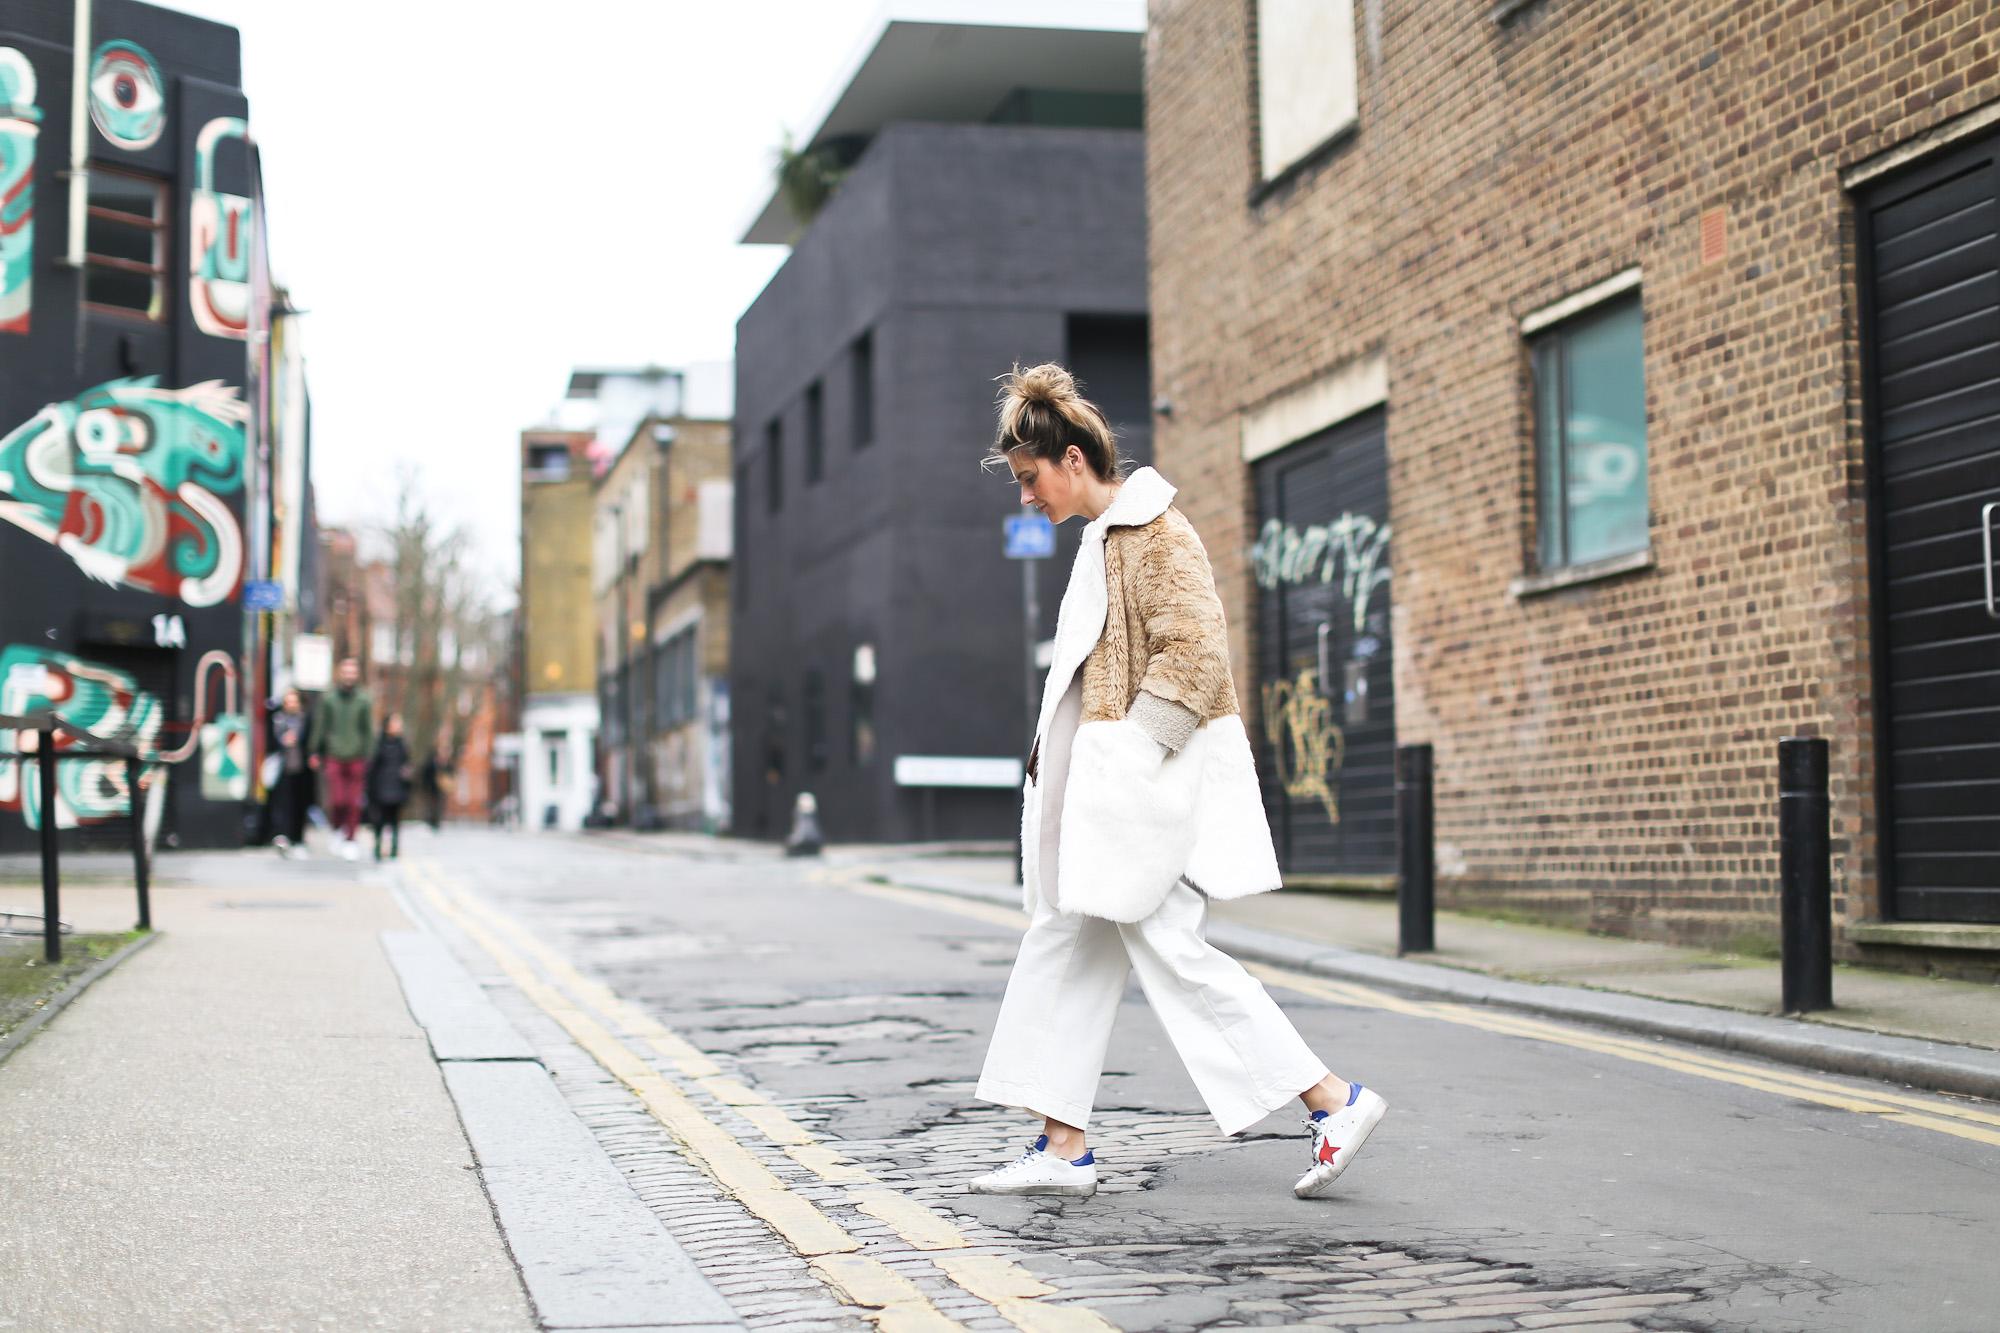 Clochet_streetstyle_asos_patchwork_faux_fur_coat_goldengoose_superstar_sneakers_topshopunique_show-6